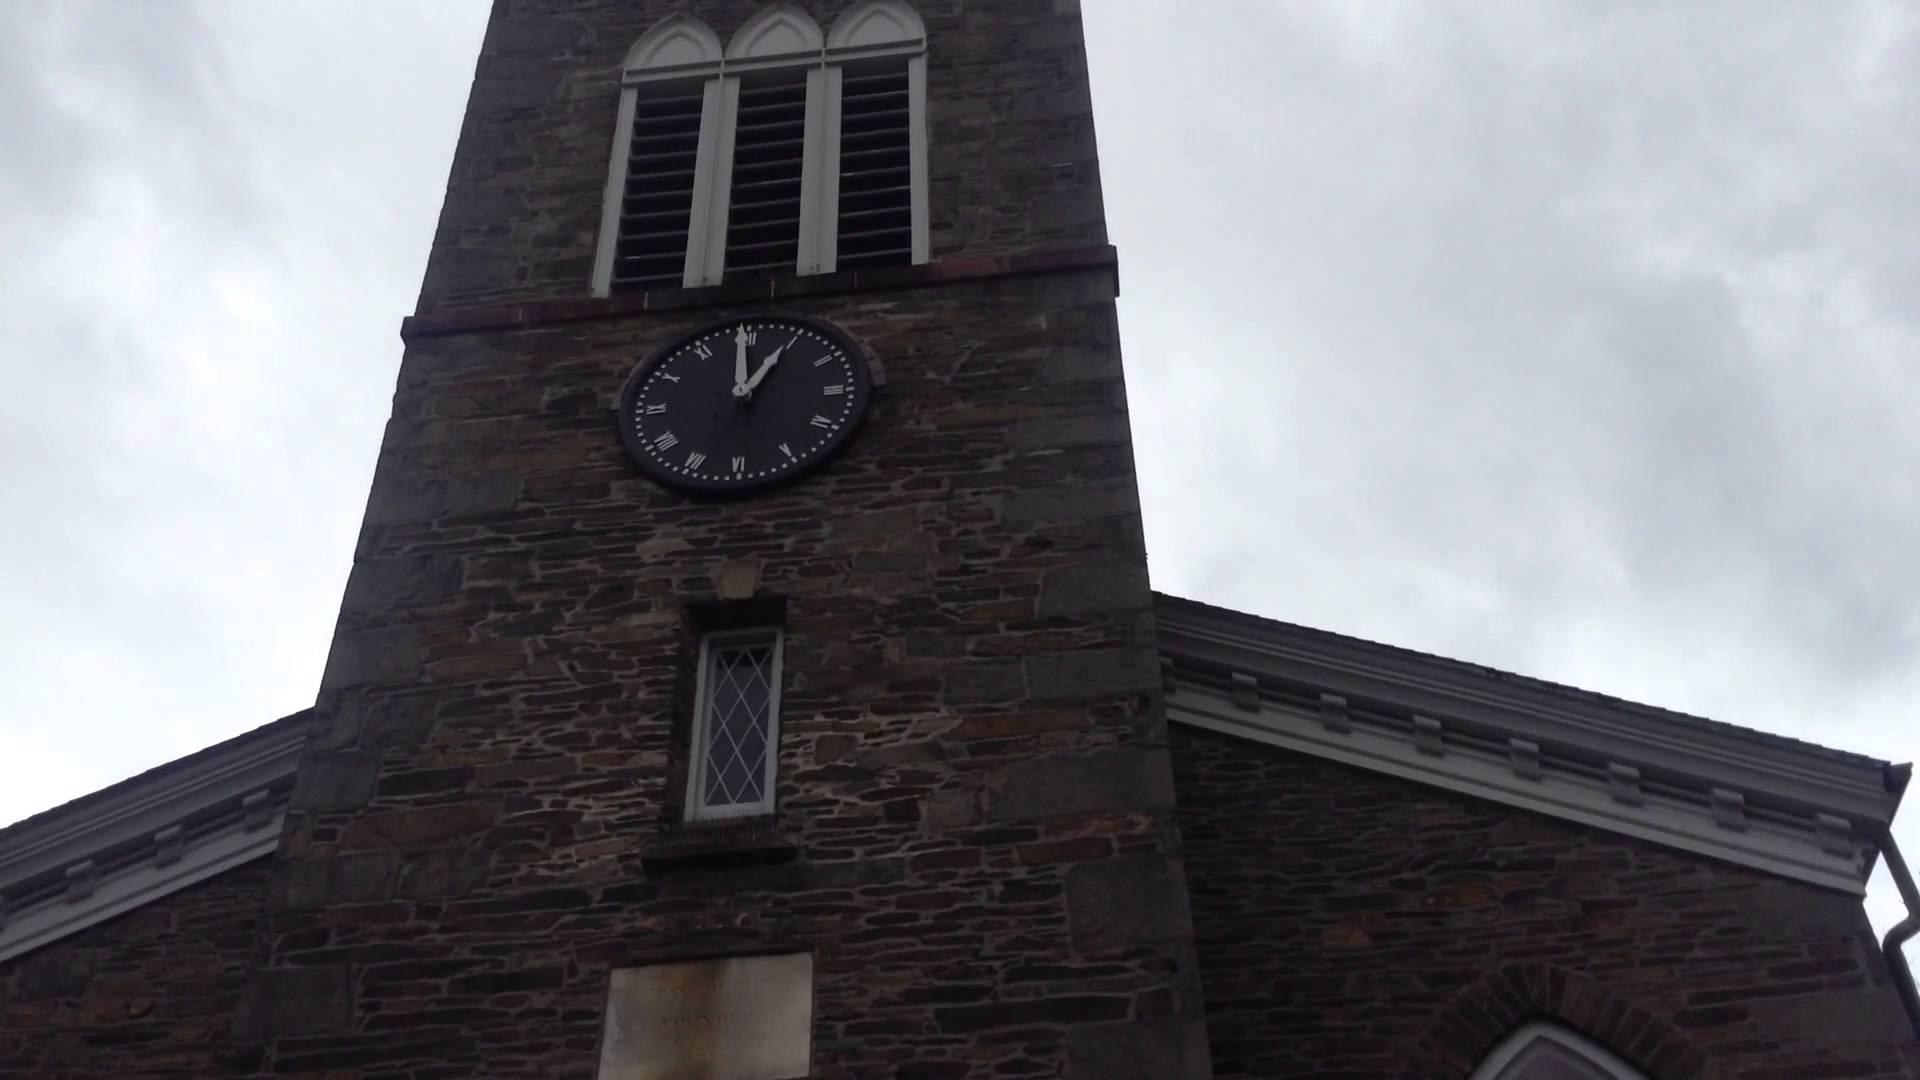 Church clock photo